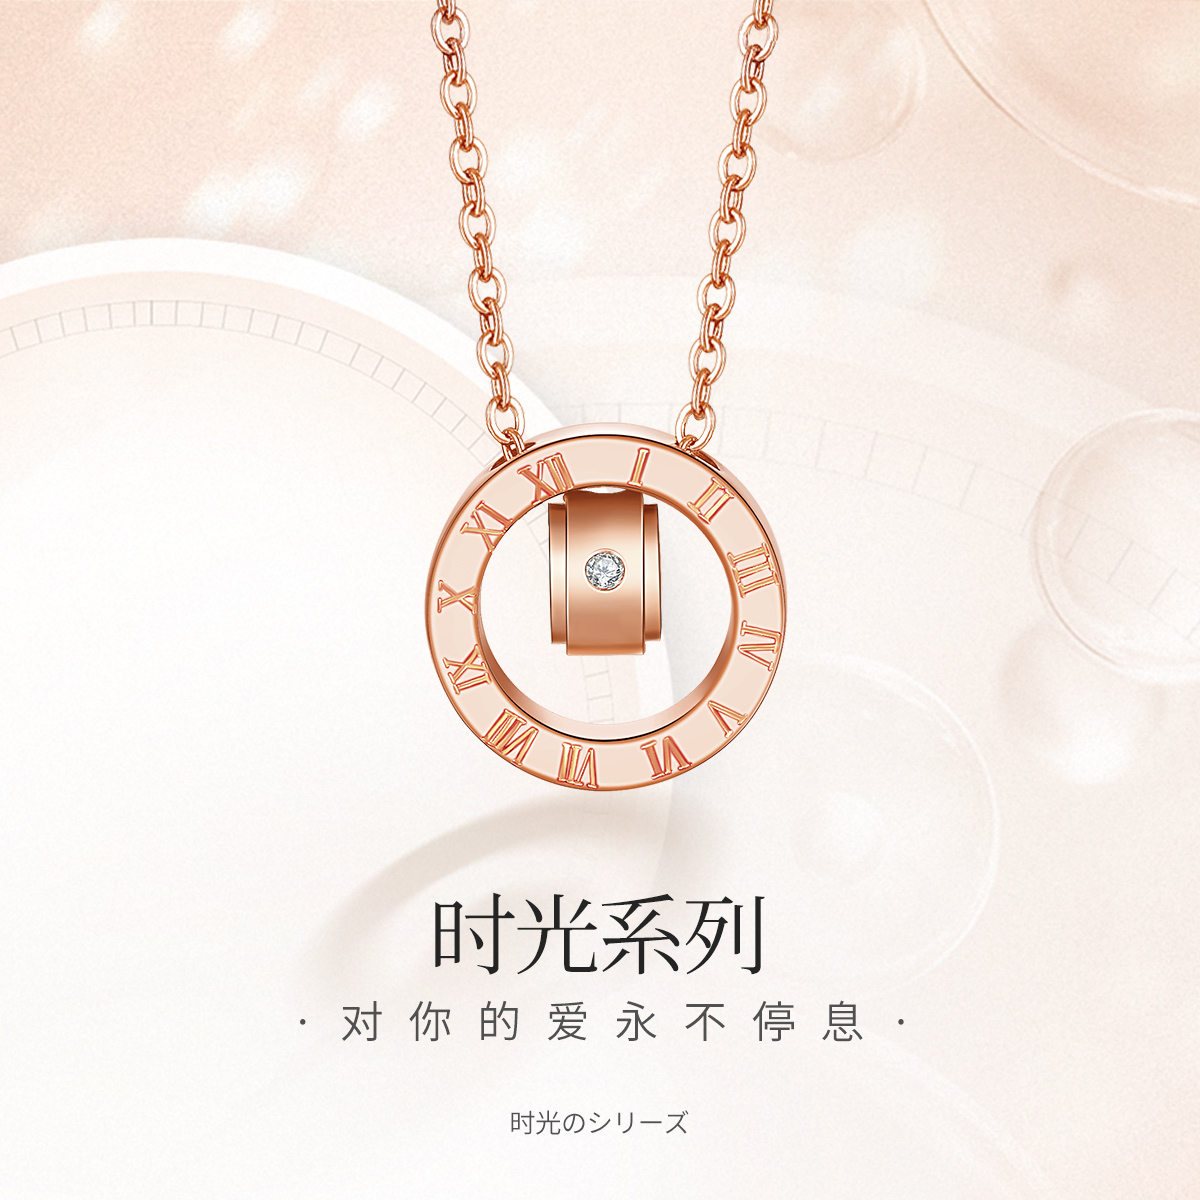 JOFFRE网红爆款 天然钻石项链罗马数字项链钻石网红圆环锁骨链